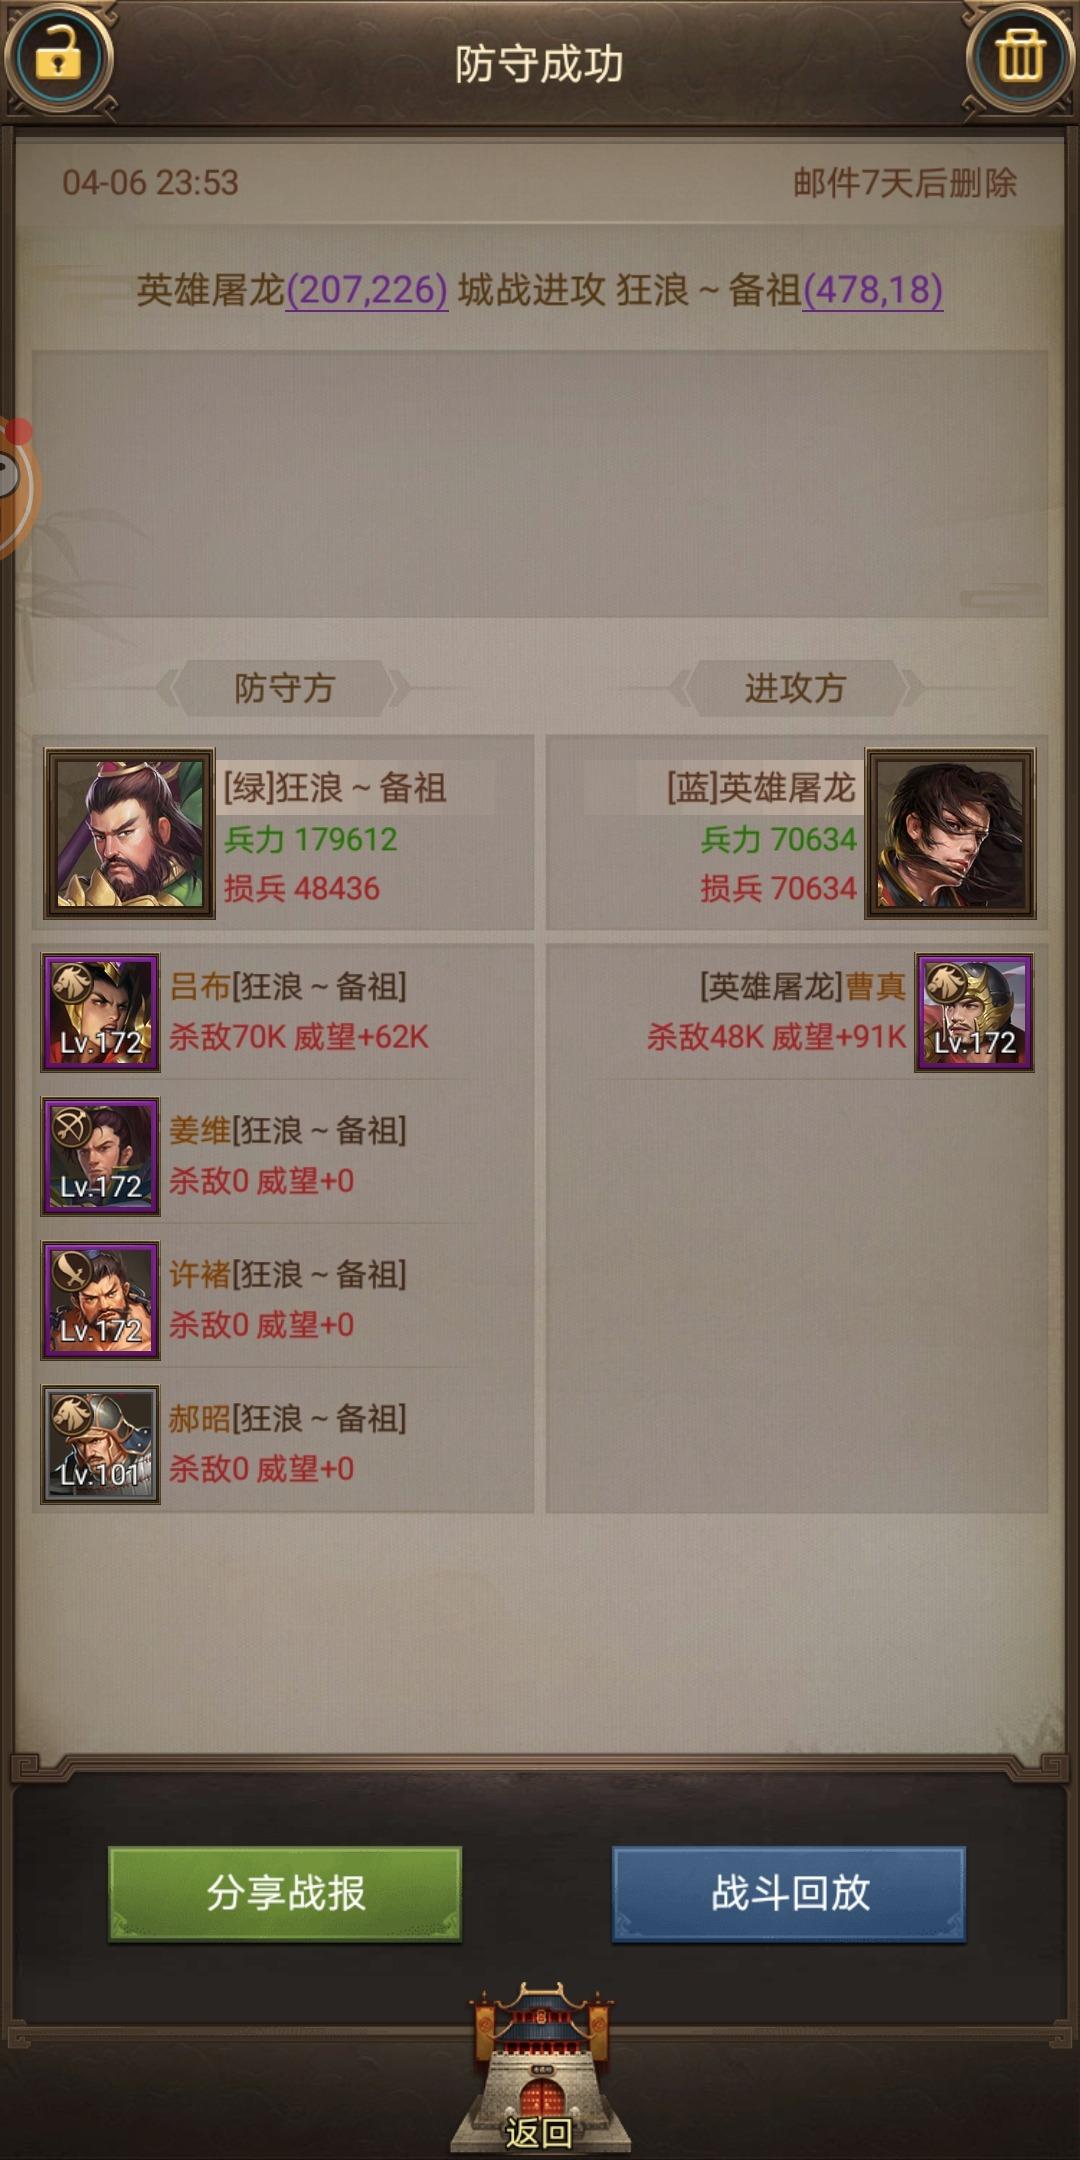 Screenshot_20200407_092616_com.juedigame.sgdjl.shoumeng.jpg